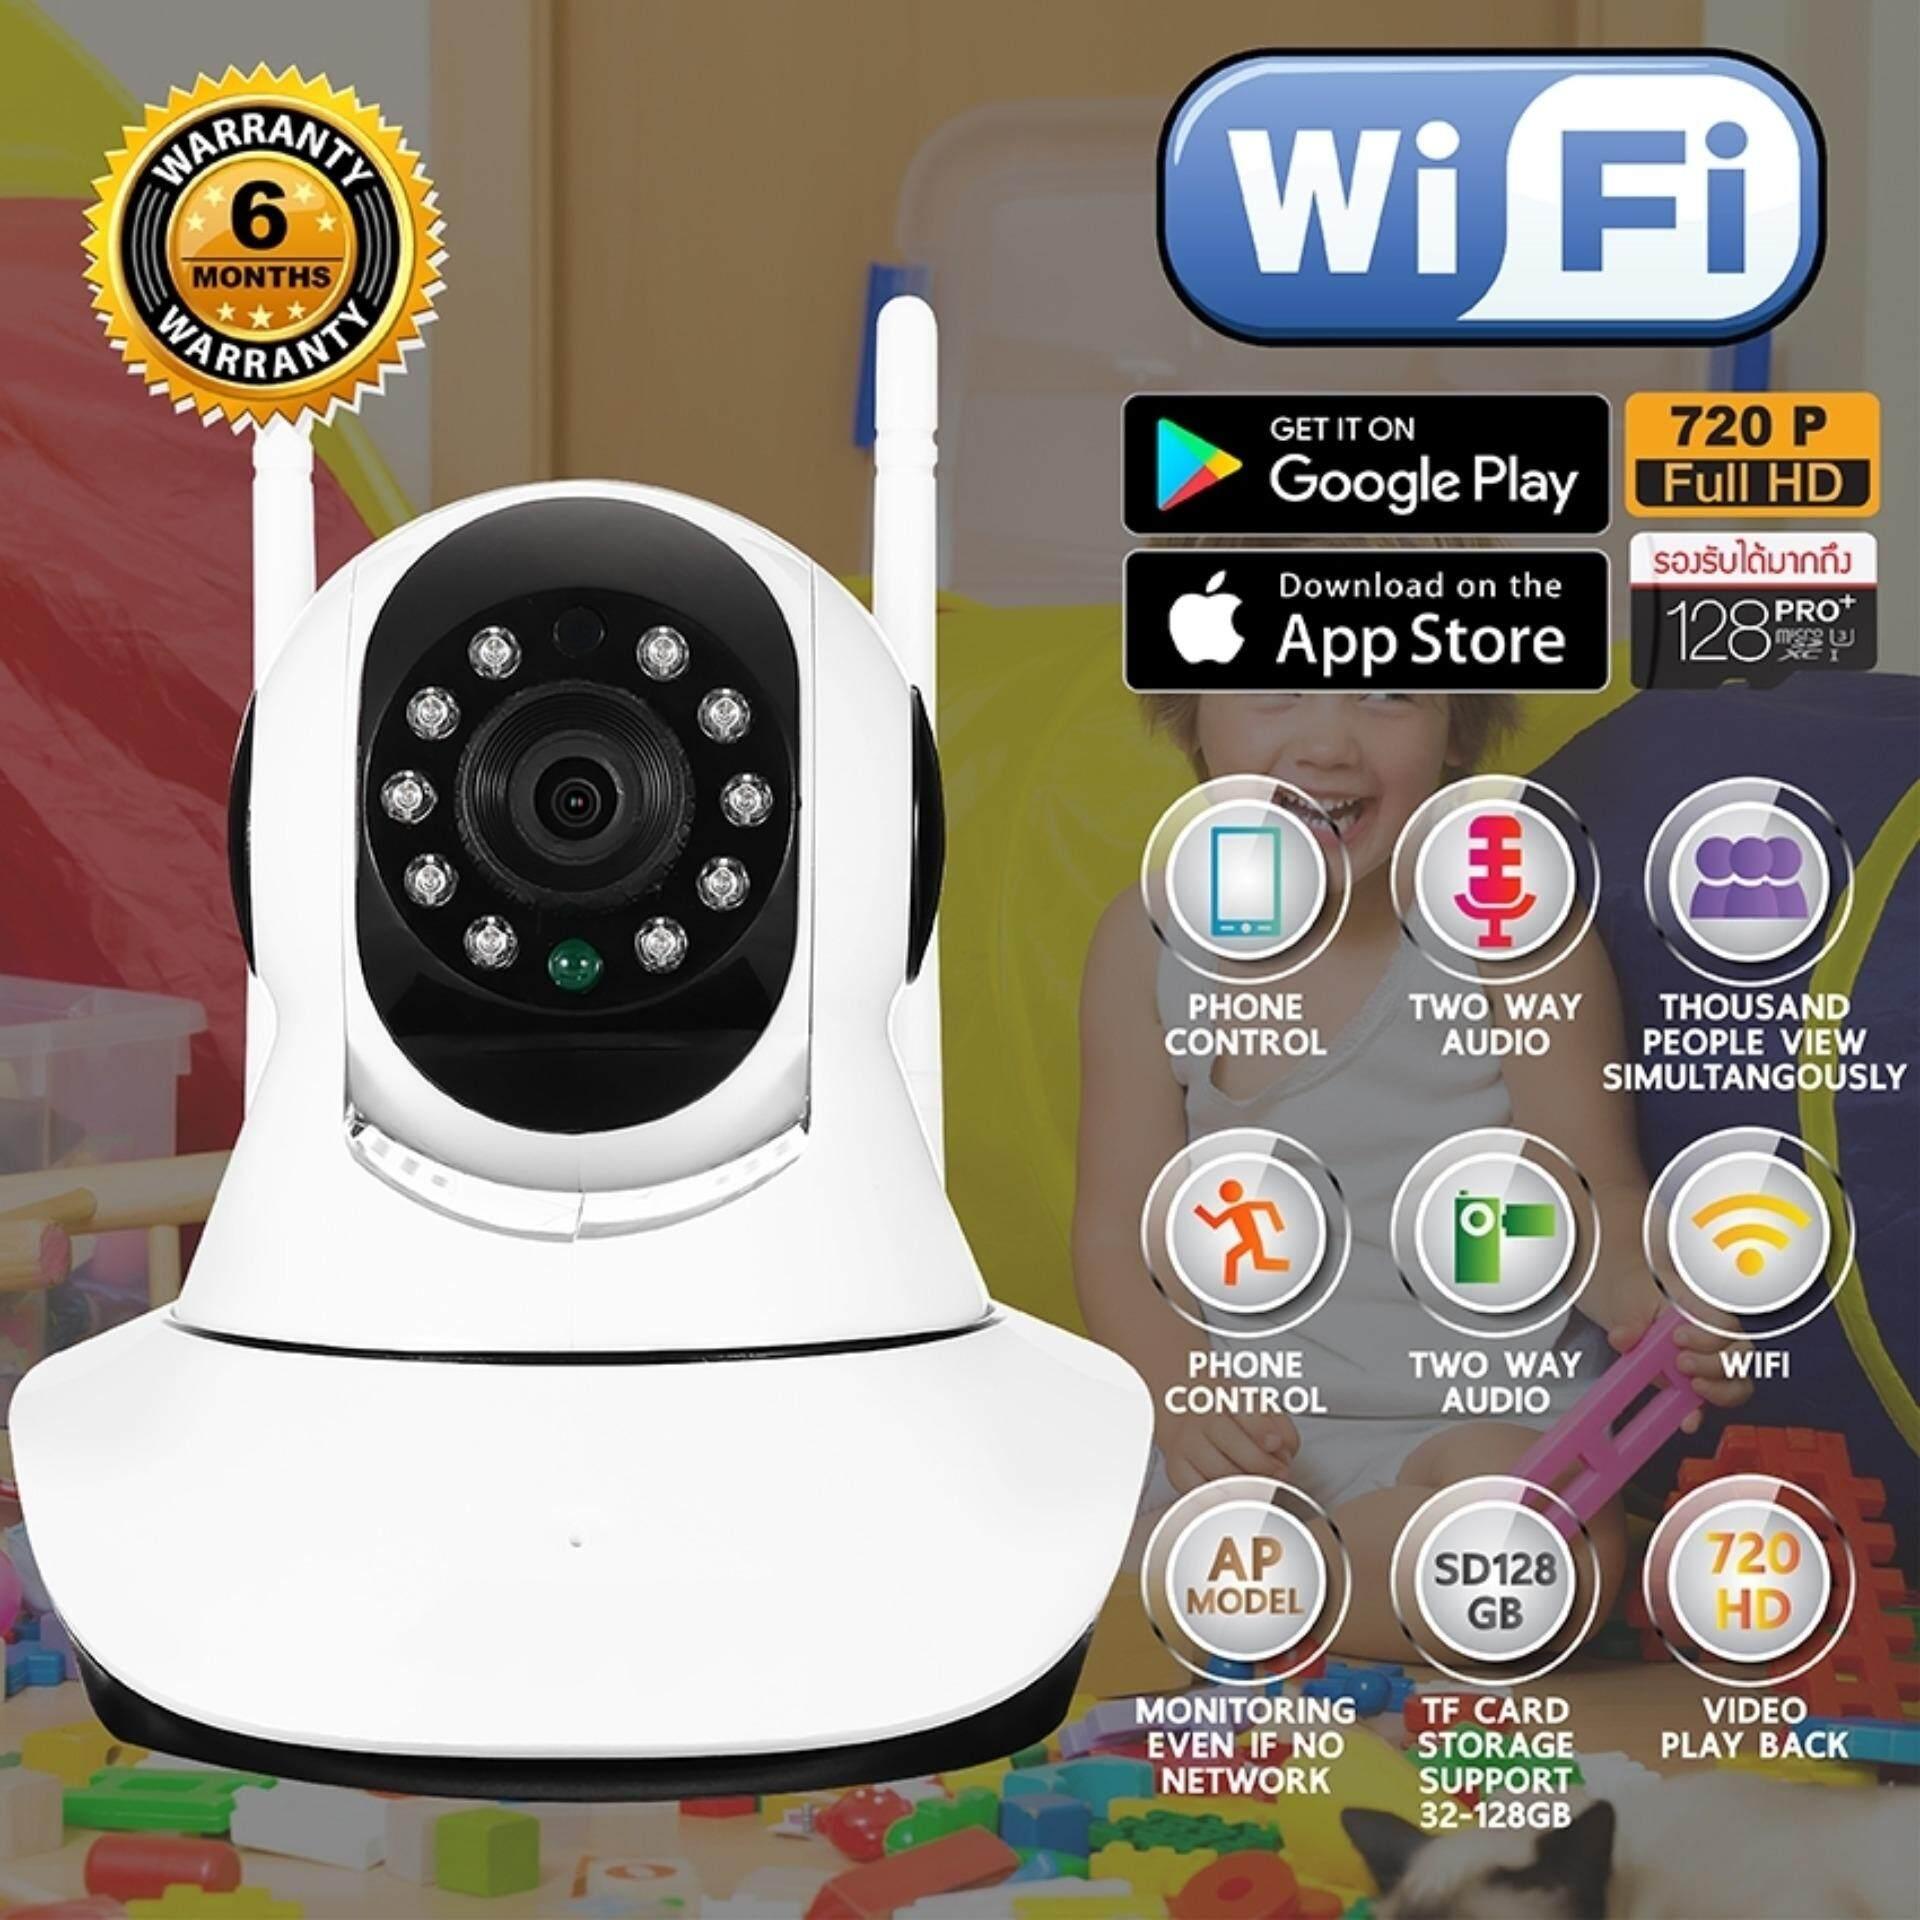 Ace Dual antenna 720Pกล้องวงจรปิด IP Camera PNP Support 128GB รุ่น keye2 – สีขาว